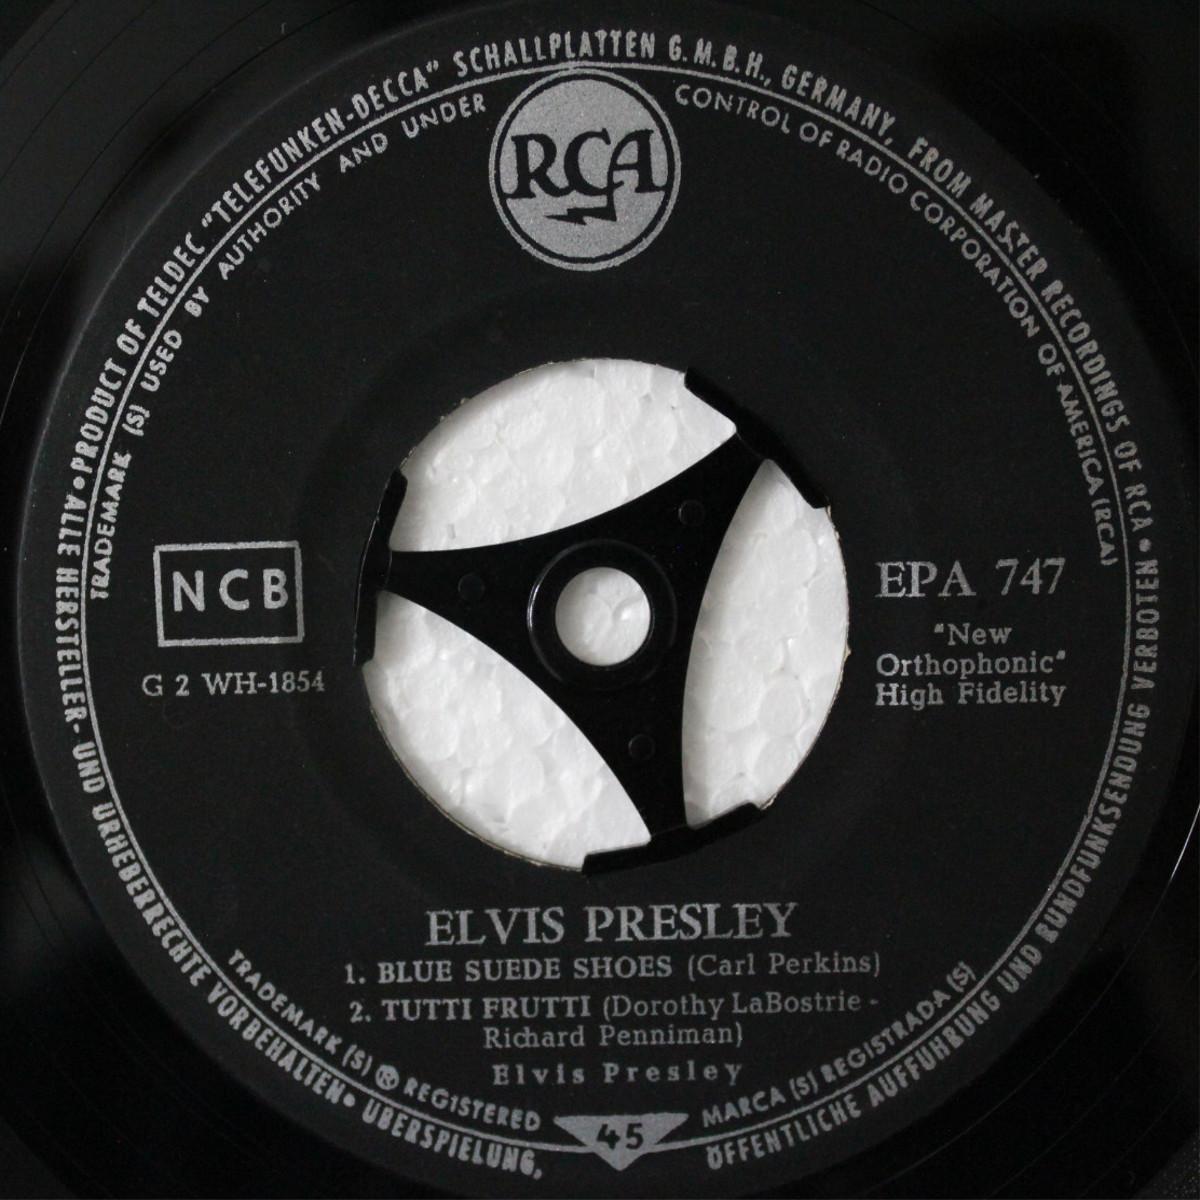 ELVIS PRESLEY Epa747chzj7u